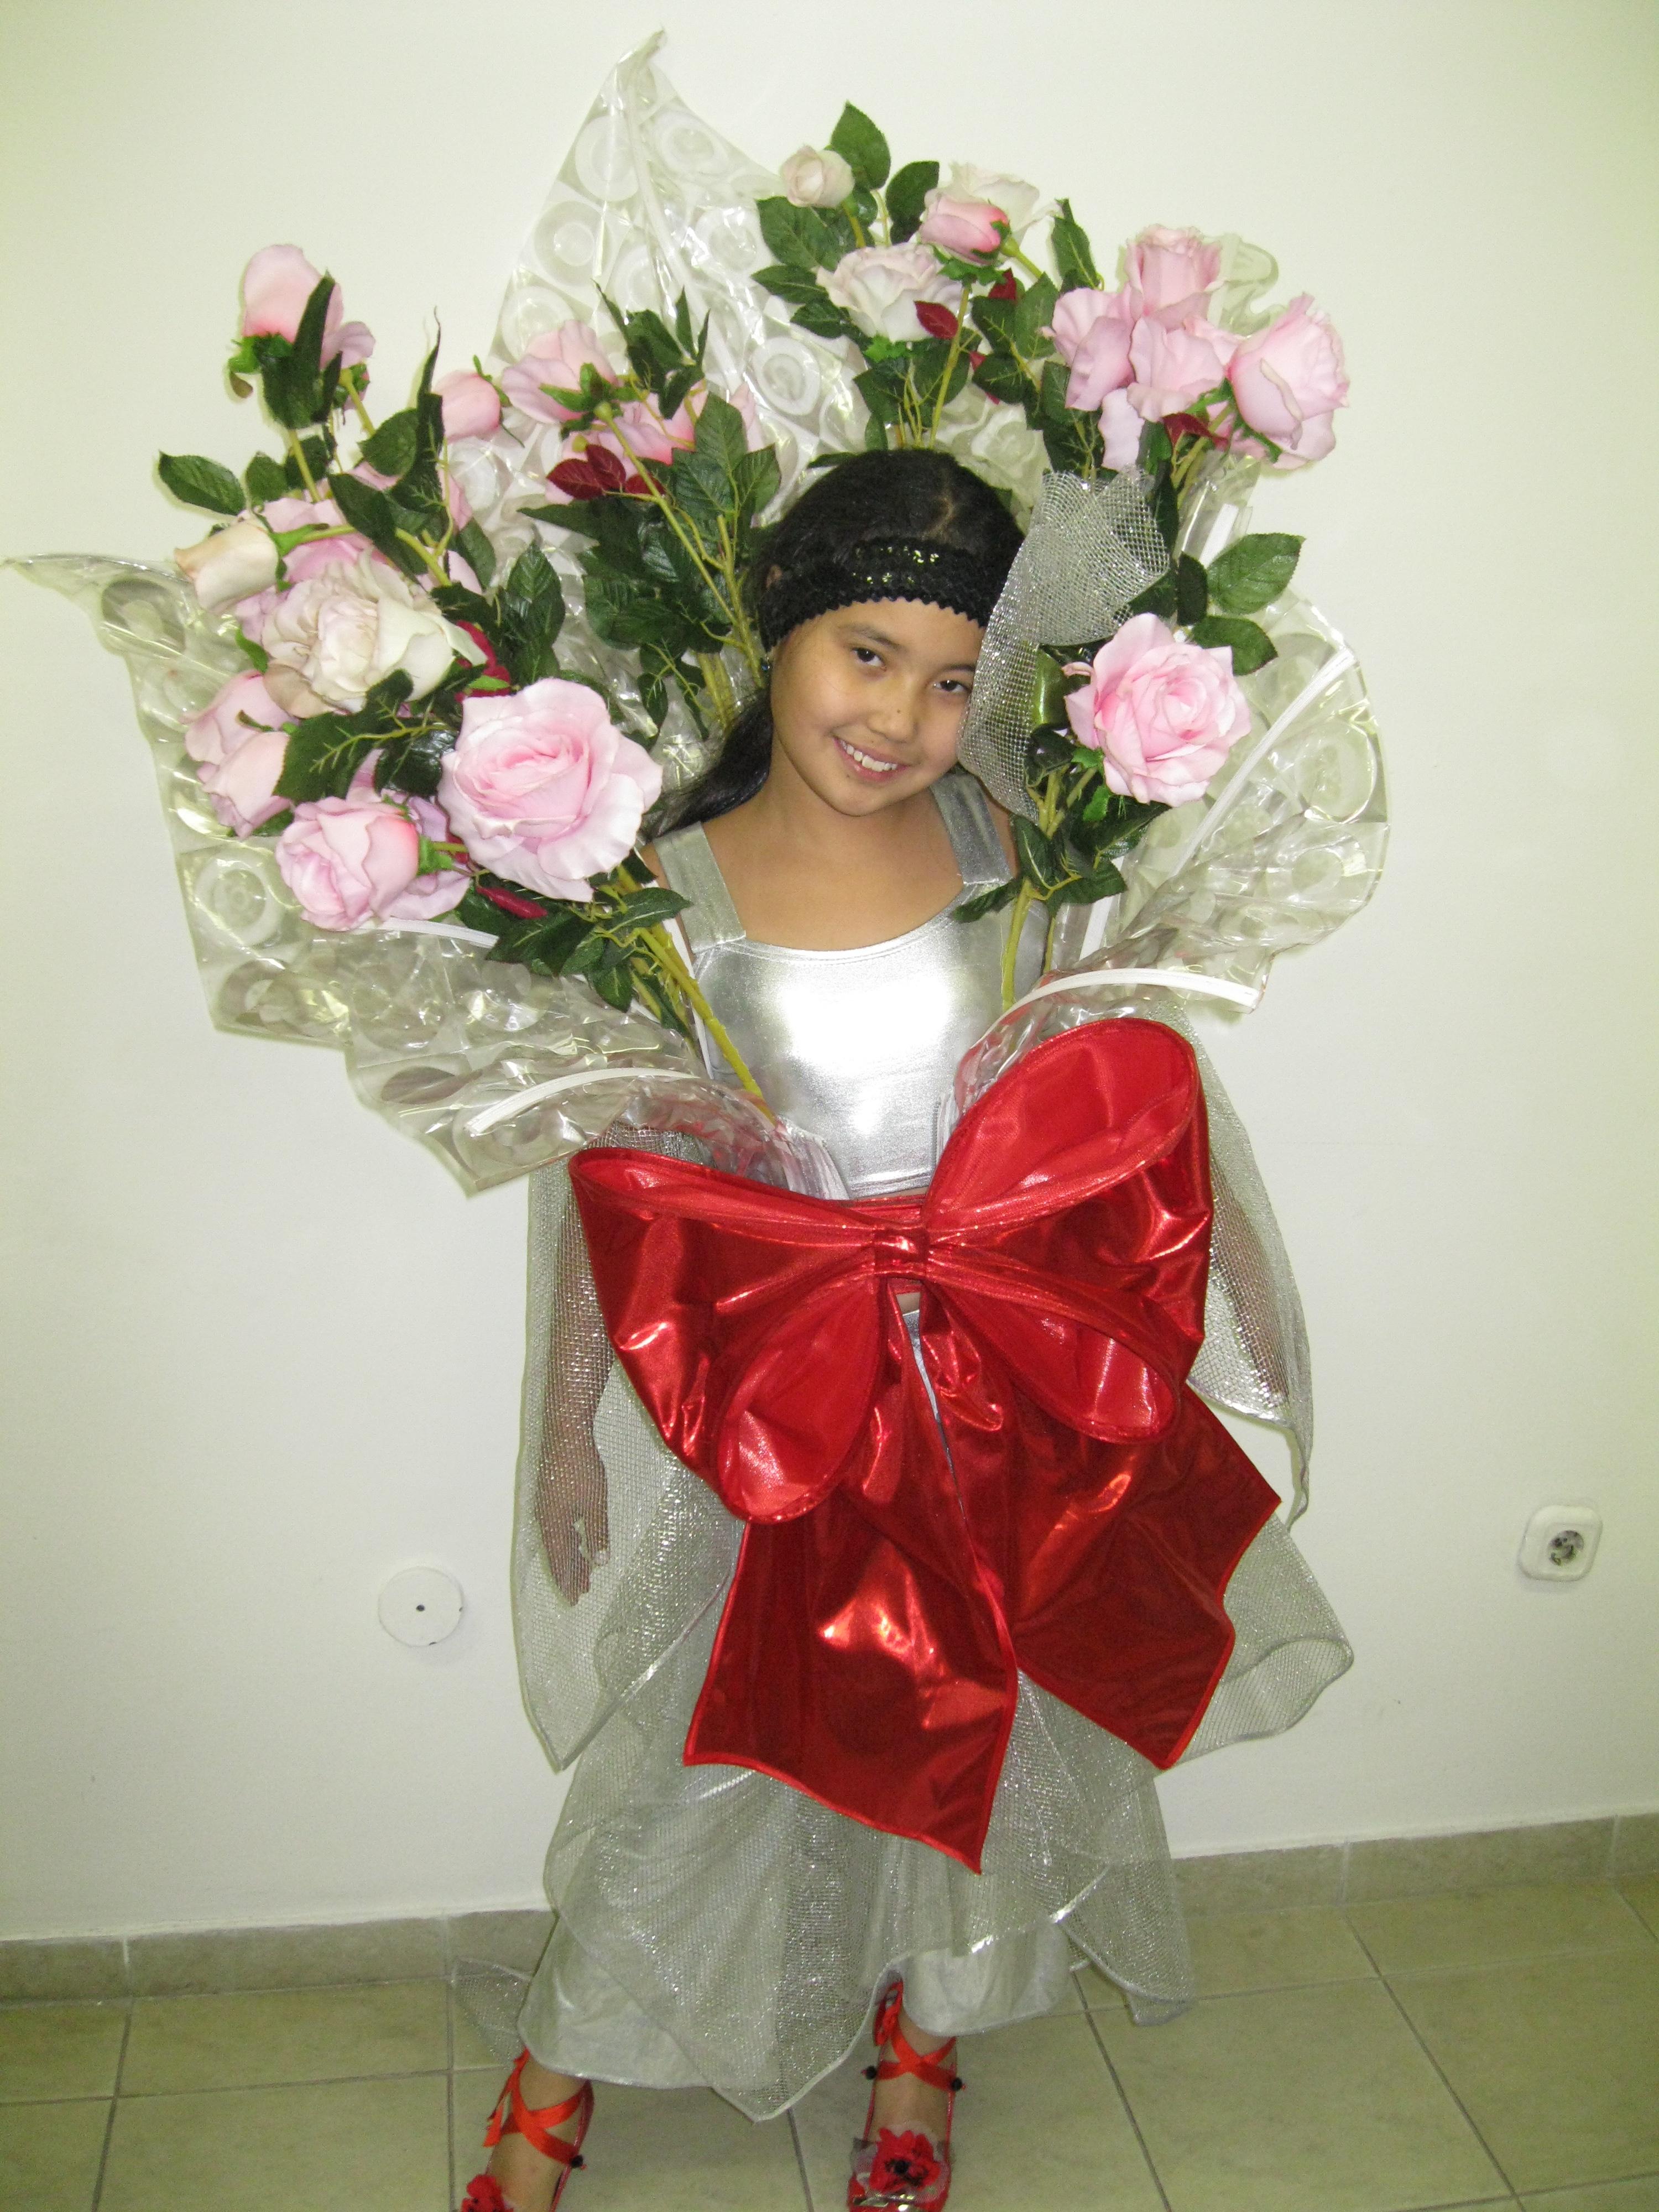 Сценарий на конкурс красоты королева роза